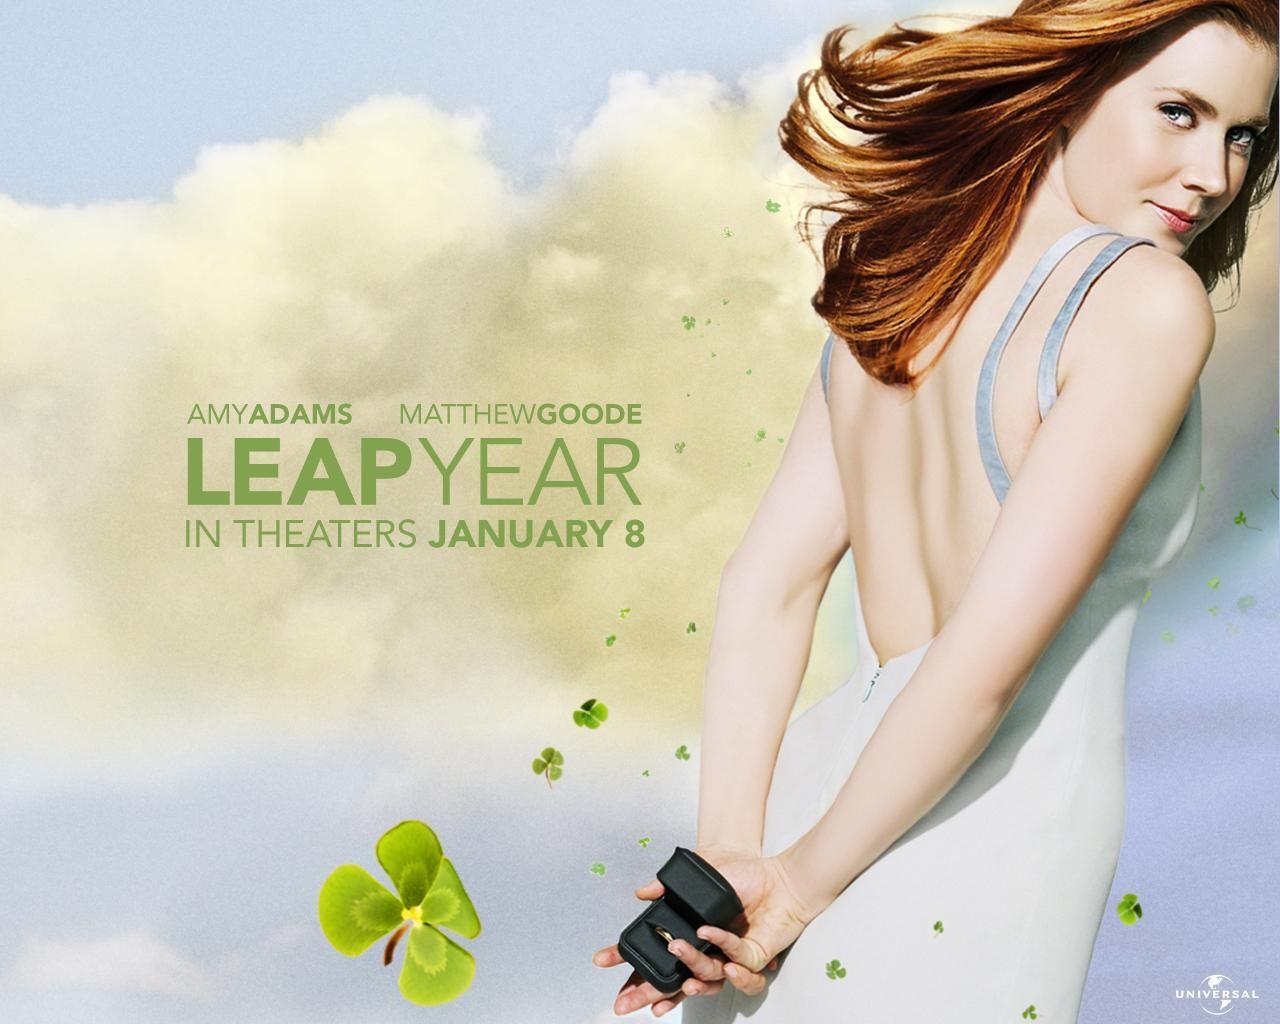 http://4.bp.blogspot.com/_FalcIpGCrlo/TEczwfDF2UI/AAAAAAAAAiU/PJdJfWjnBGE/s1600/Tenias_que_ser_tu_Leap_Year-261685575-large.jpg